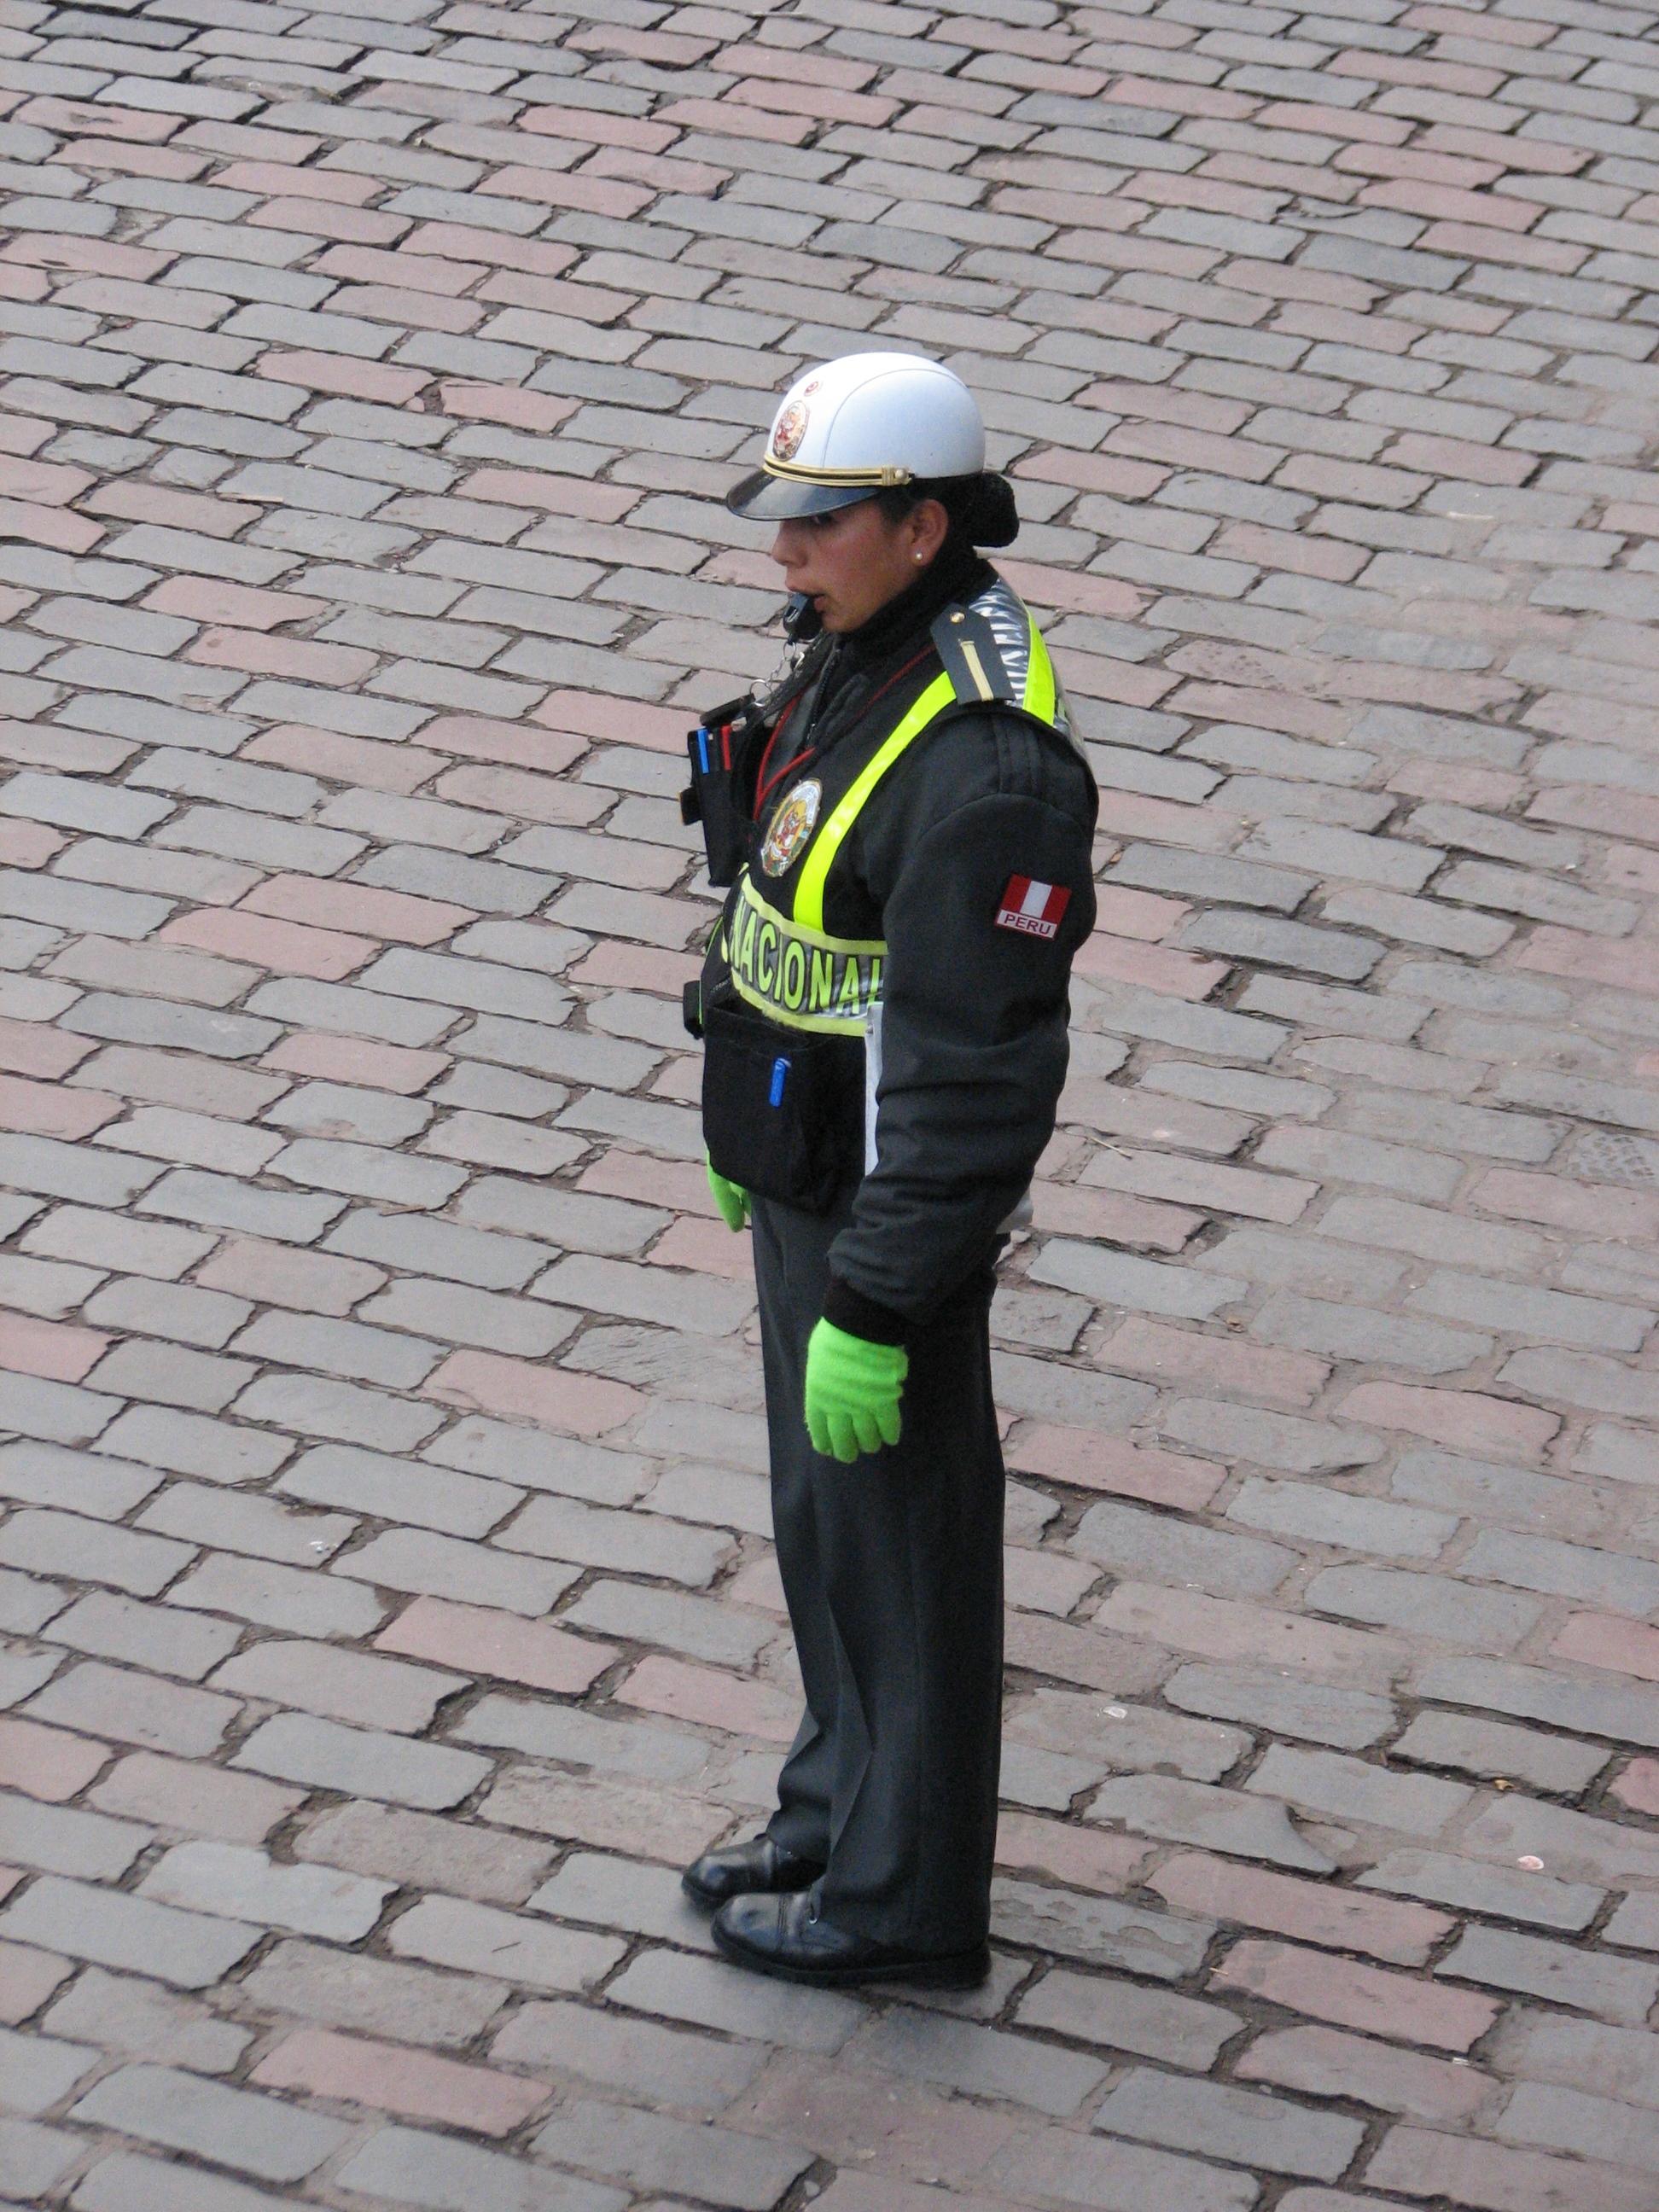 Imagen de policia de transito imagui for Ministerio de policia nacional